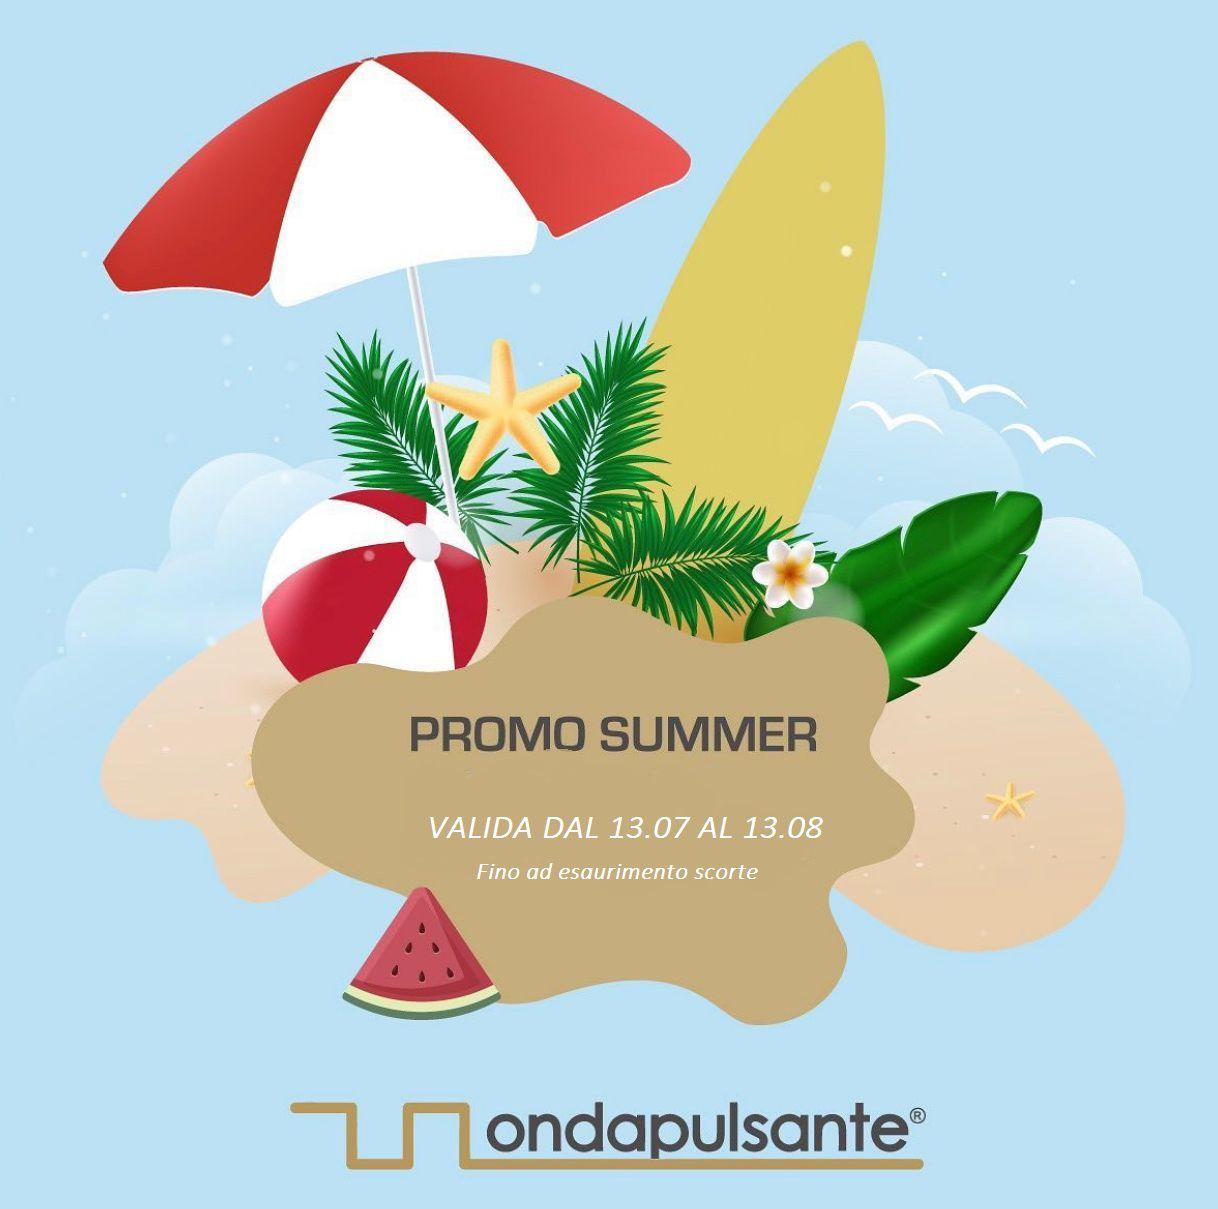 Promo summer ondapulsante